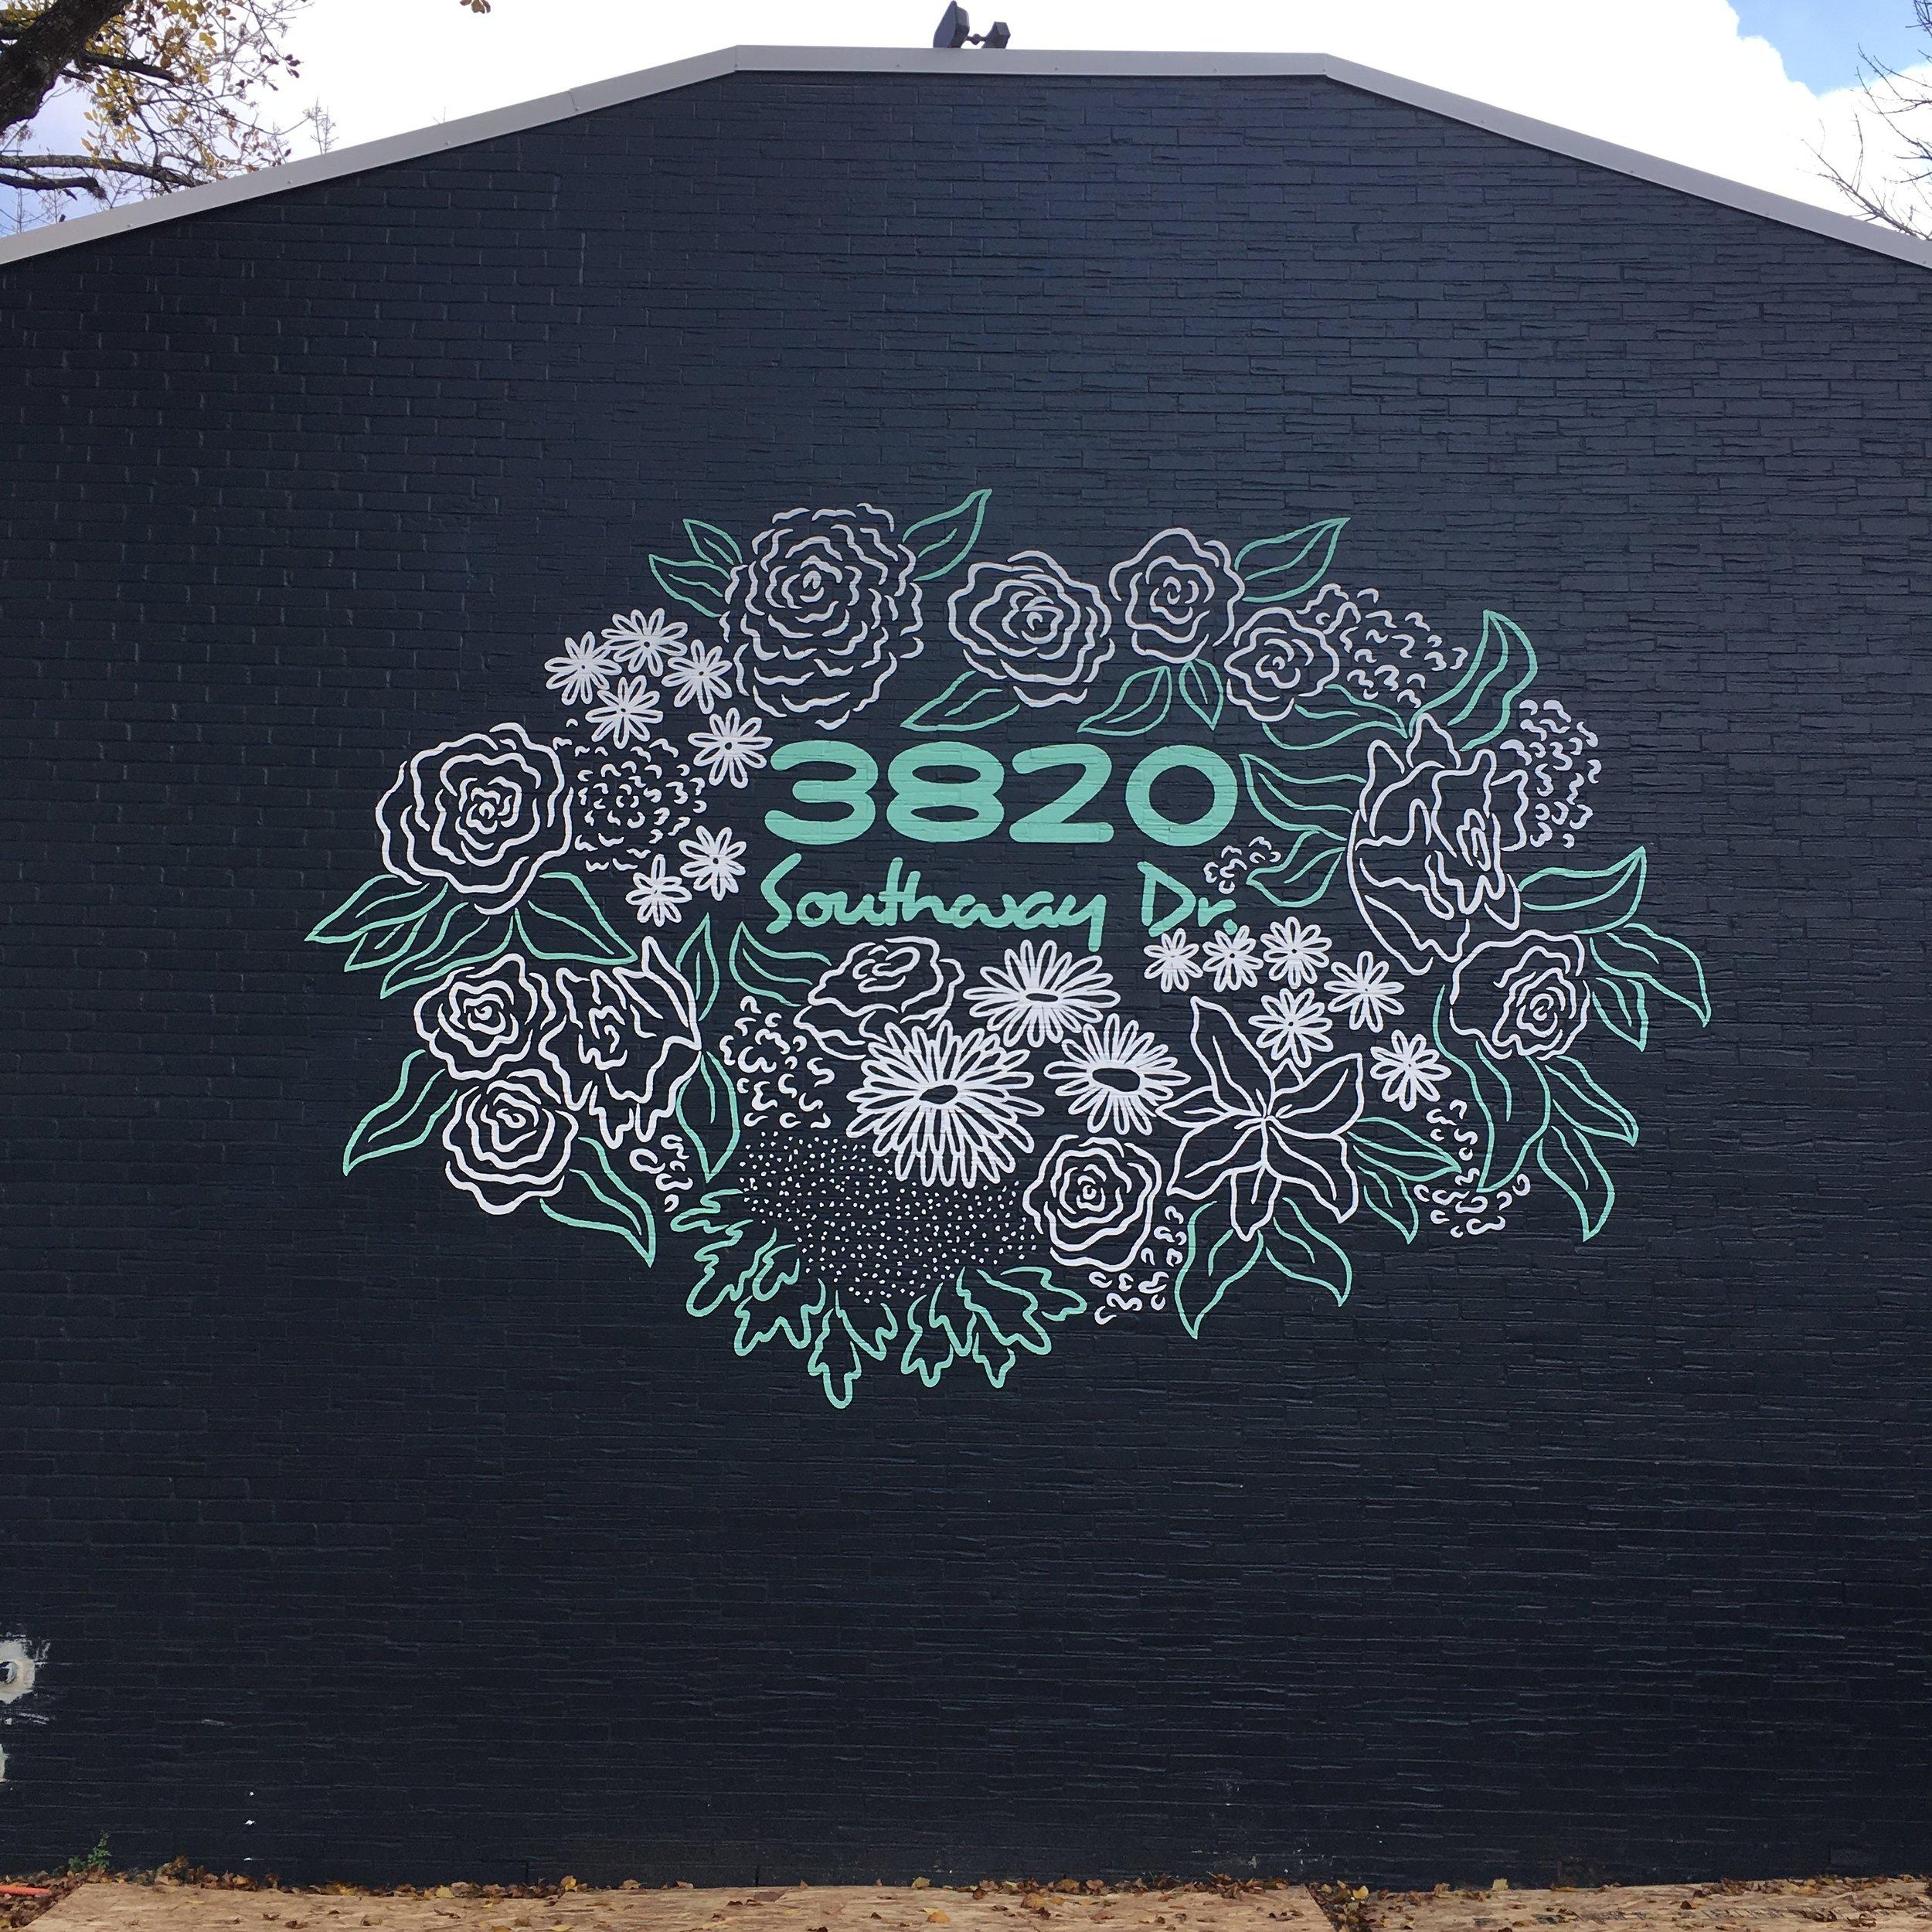 Condo Address Mural, Austin